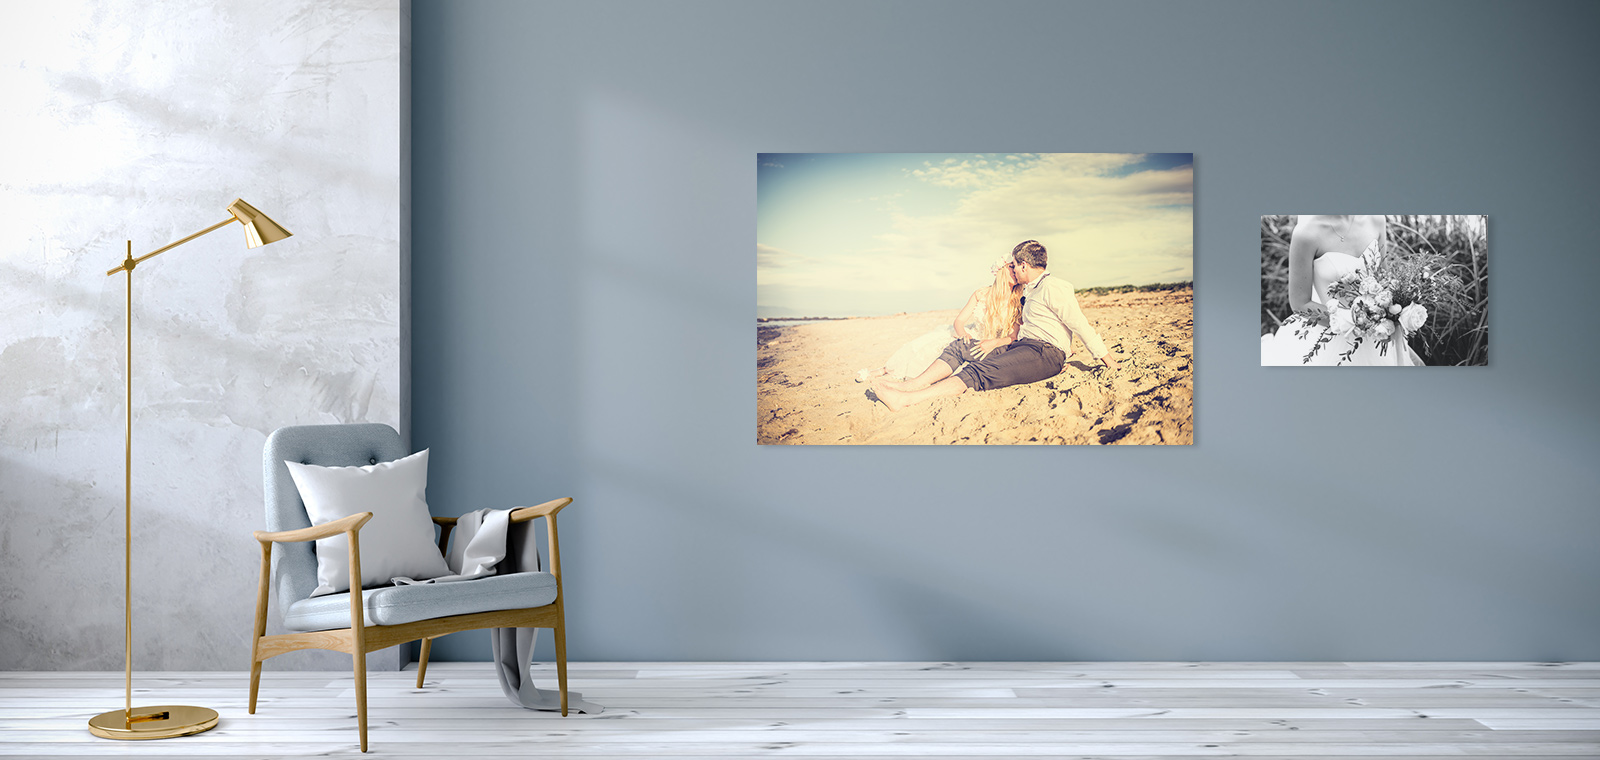 wandbilder hochwertige materialien f r daheim oder werbung. Black Bedroom Furniture Sets. Home Design Ideas